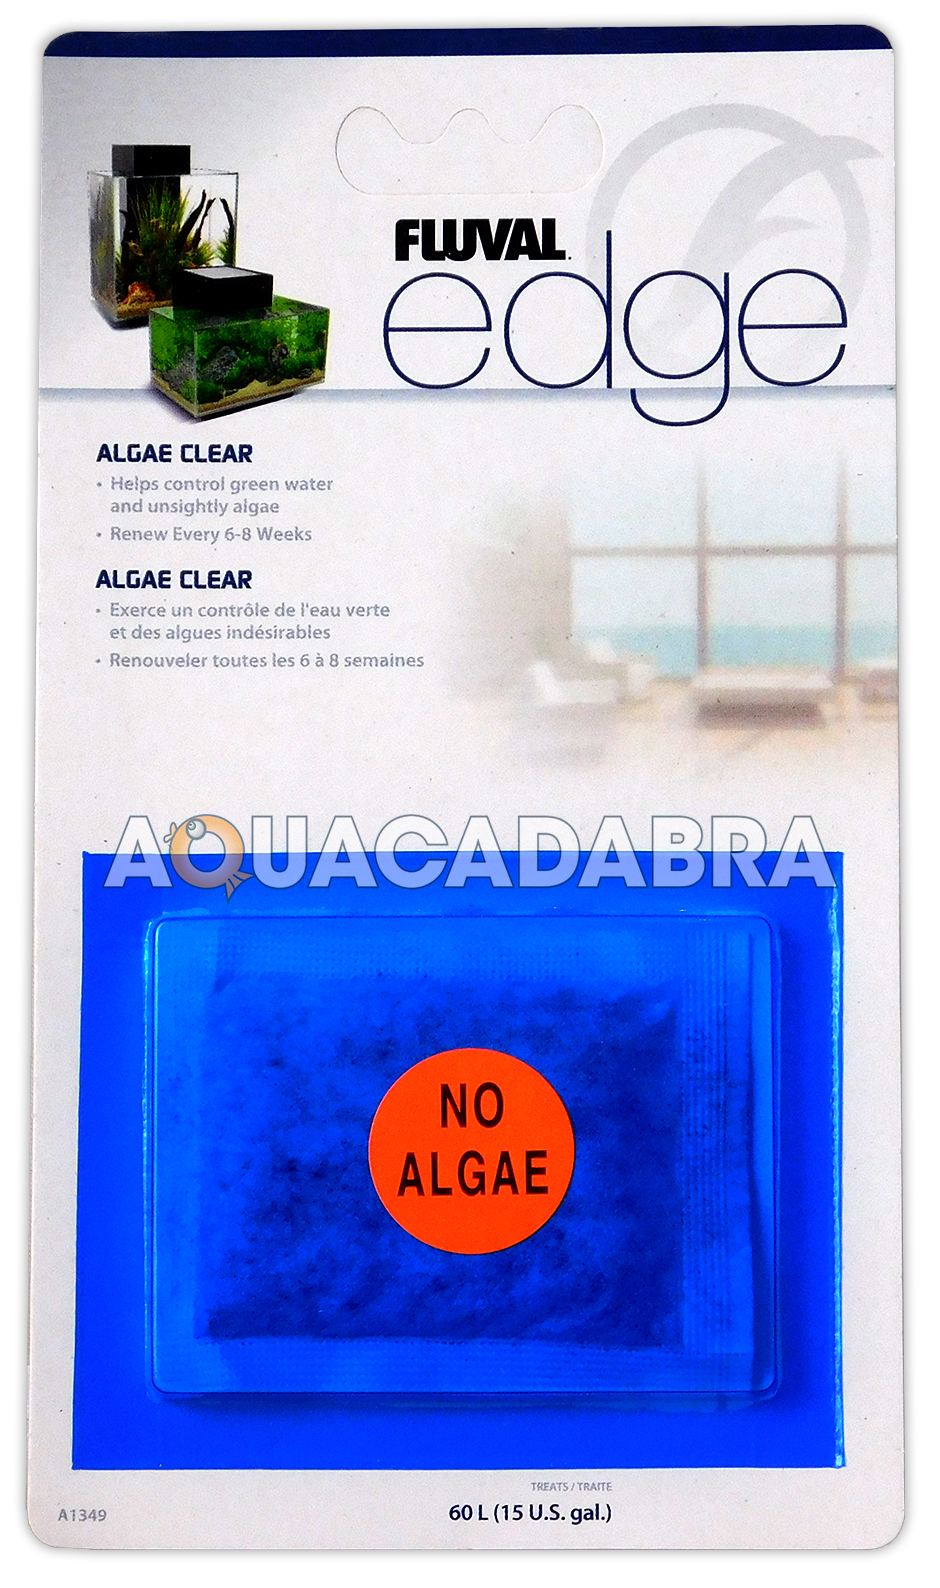 Fluval edge fish tank algae clear sachet for filter green for Green water in fish tank